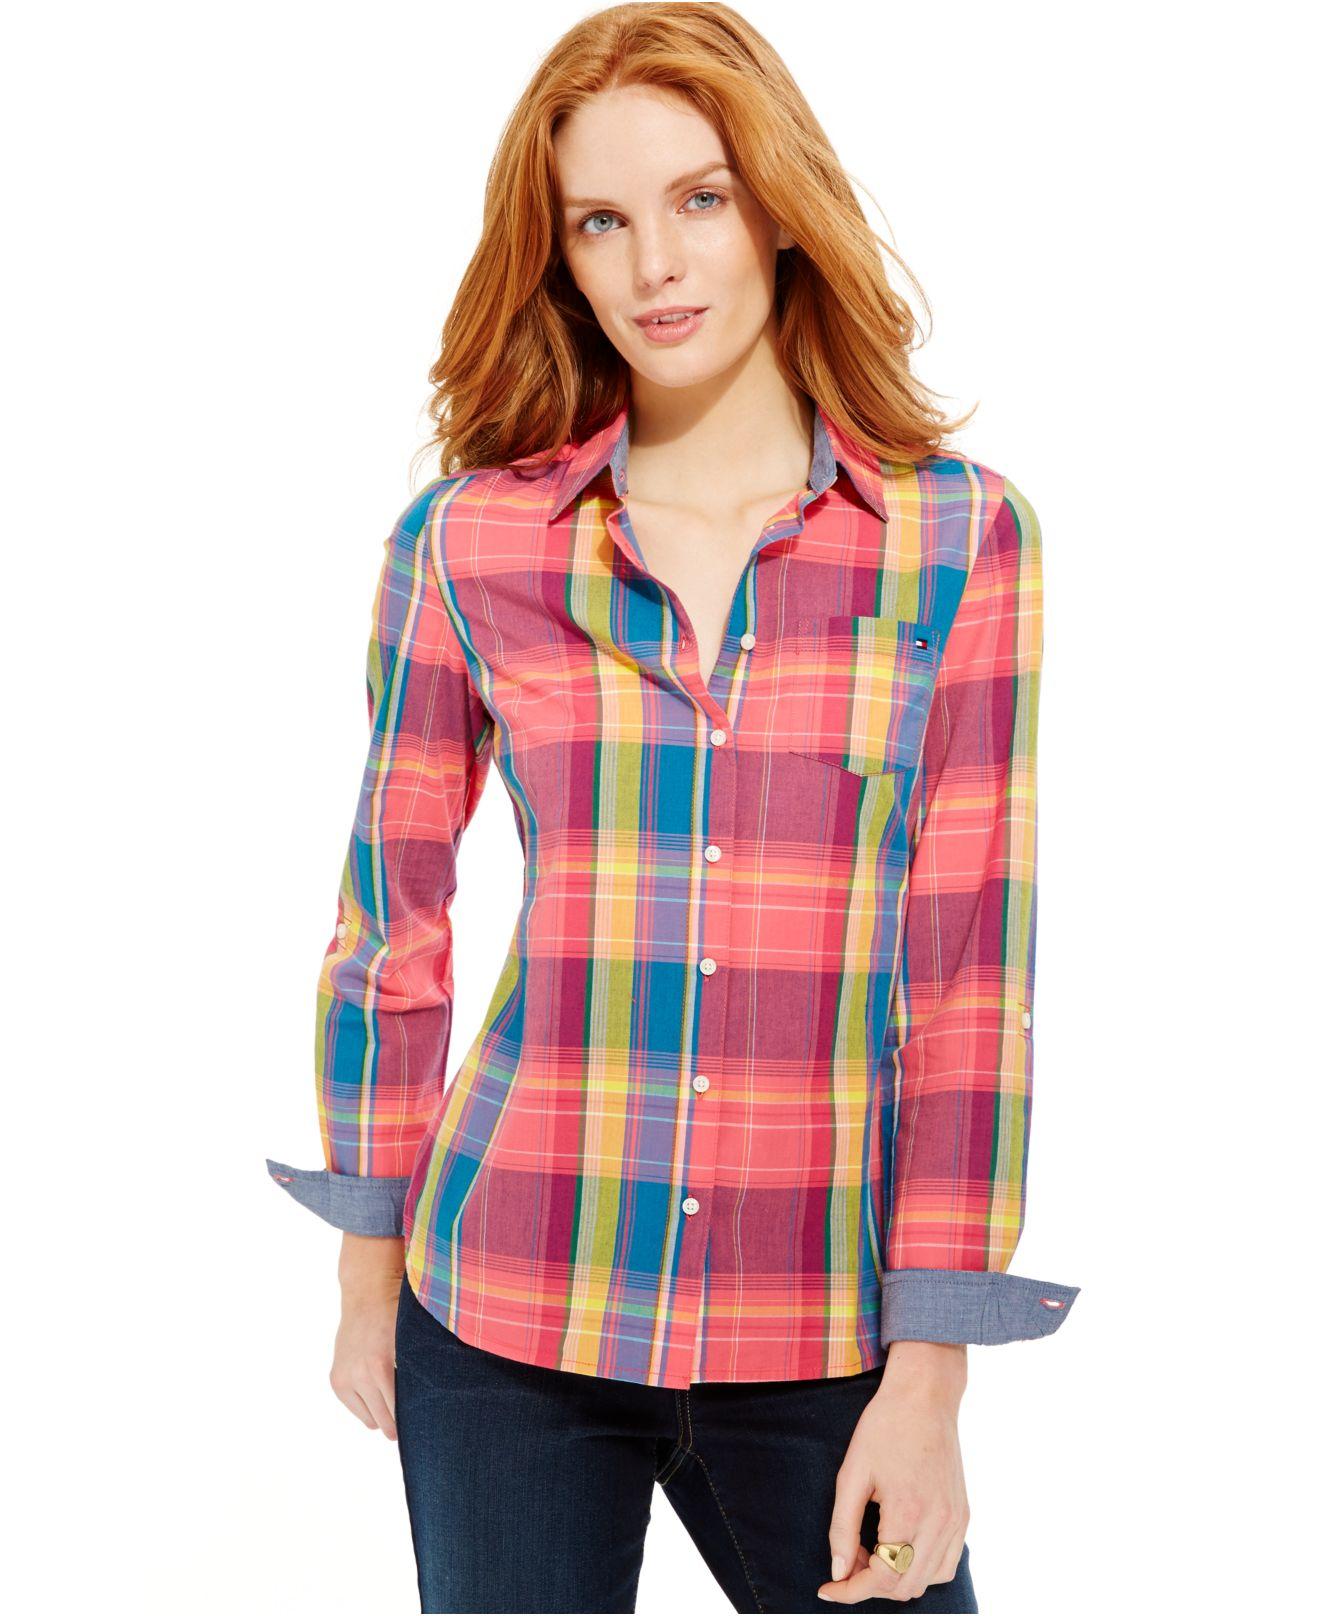 Lyst Tommy Hilfiger Multicolor Plaid Button Down Shirt